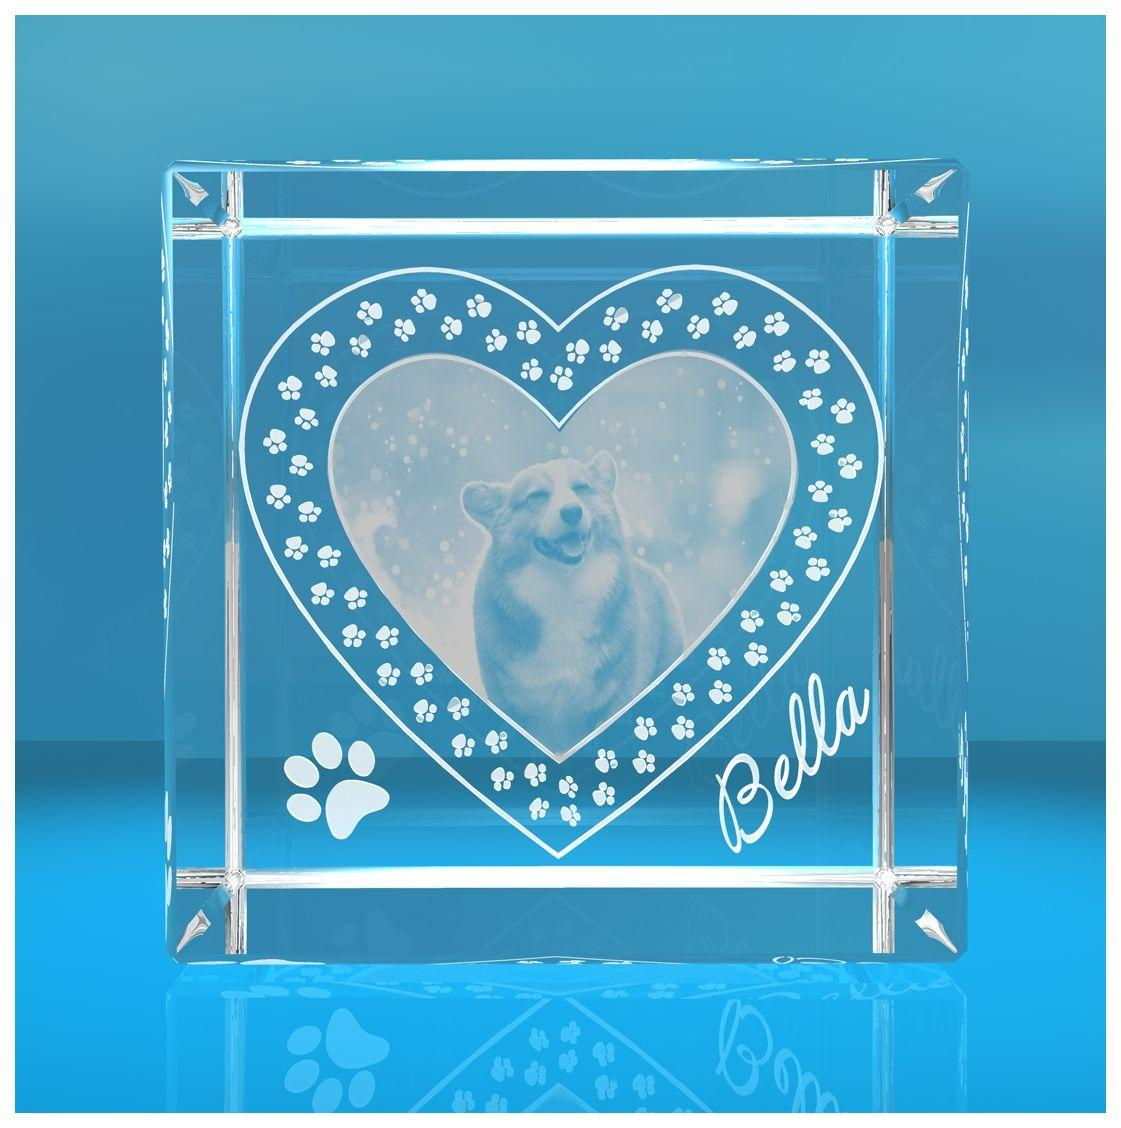 VIP-LASER I 2D I Glasfoto Kristall Würfel I Gravur Deines Haustiers im Pfotenherz / Hund / Katze in 2D - Motivart: 2D Gravur - Personalisierung: Text + Fotogravur